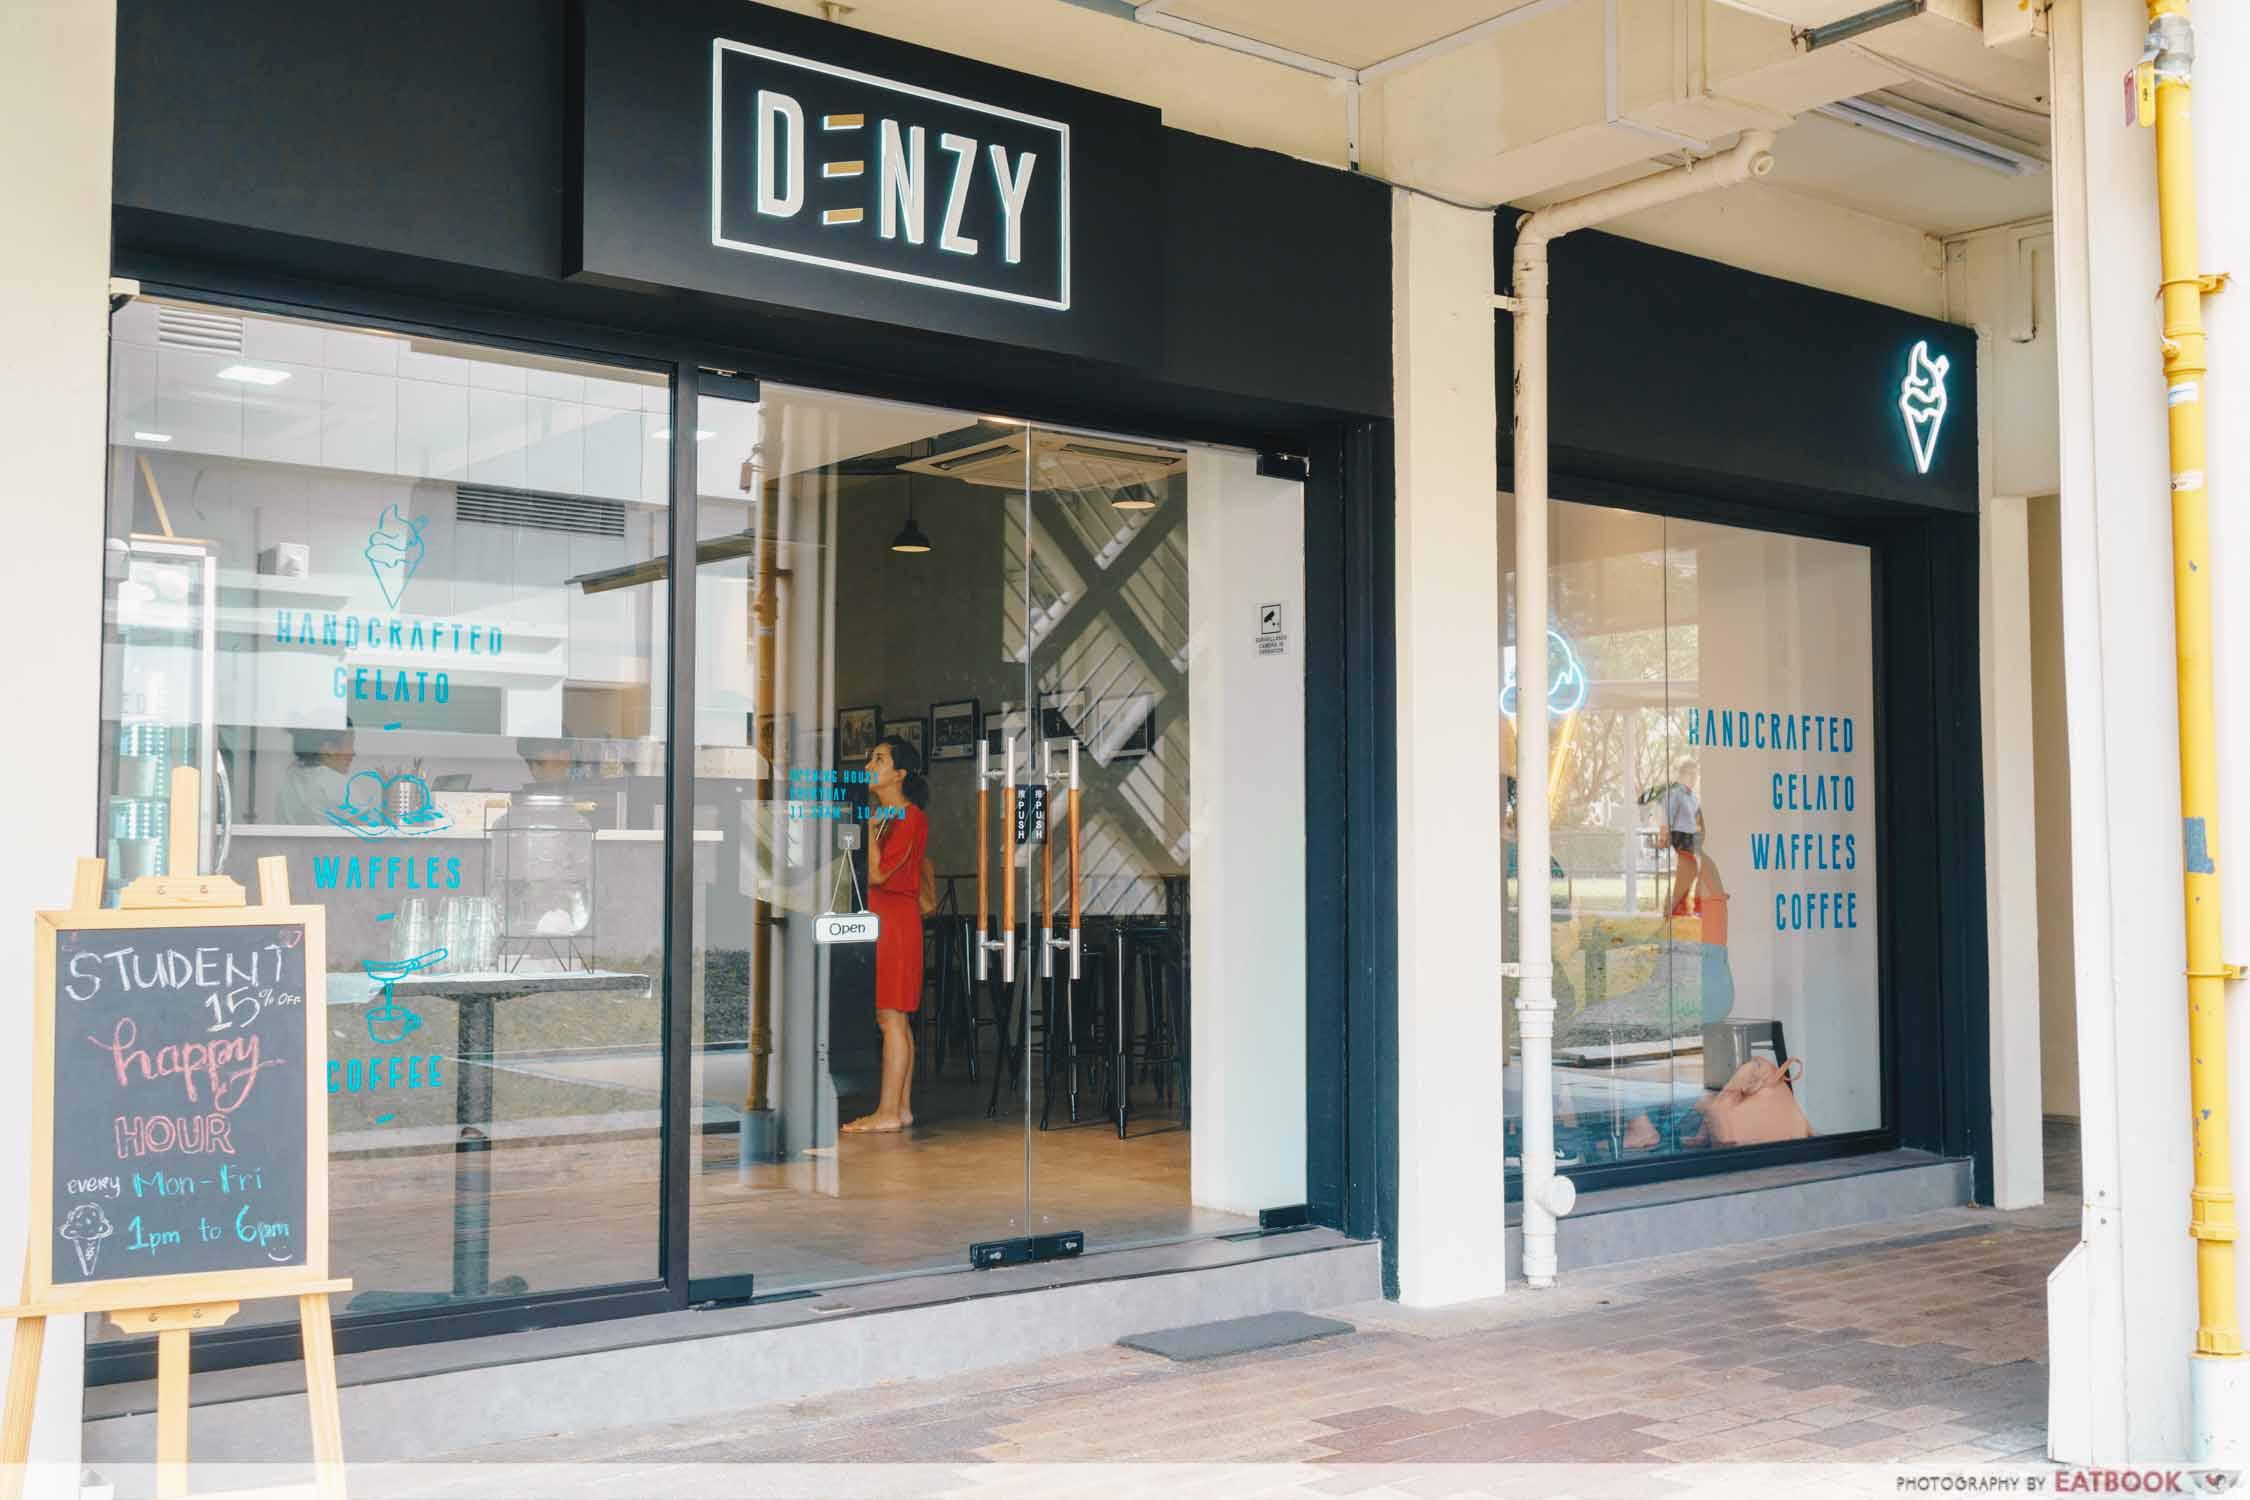 Denzy Gelato - Storefront